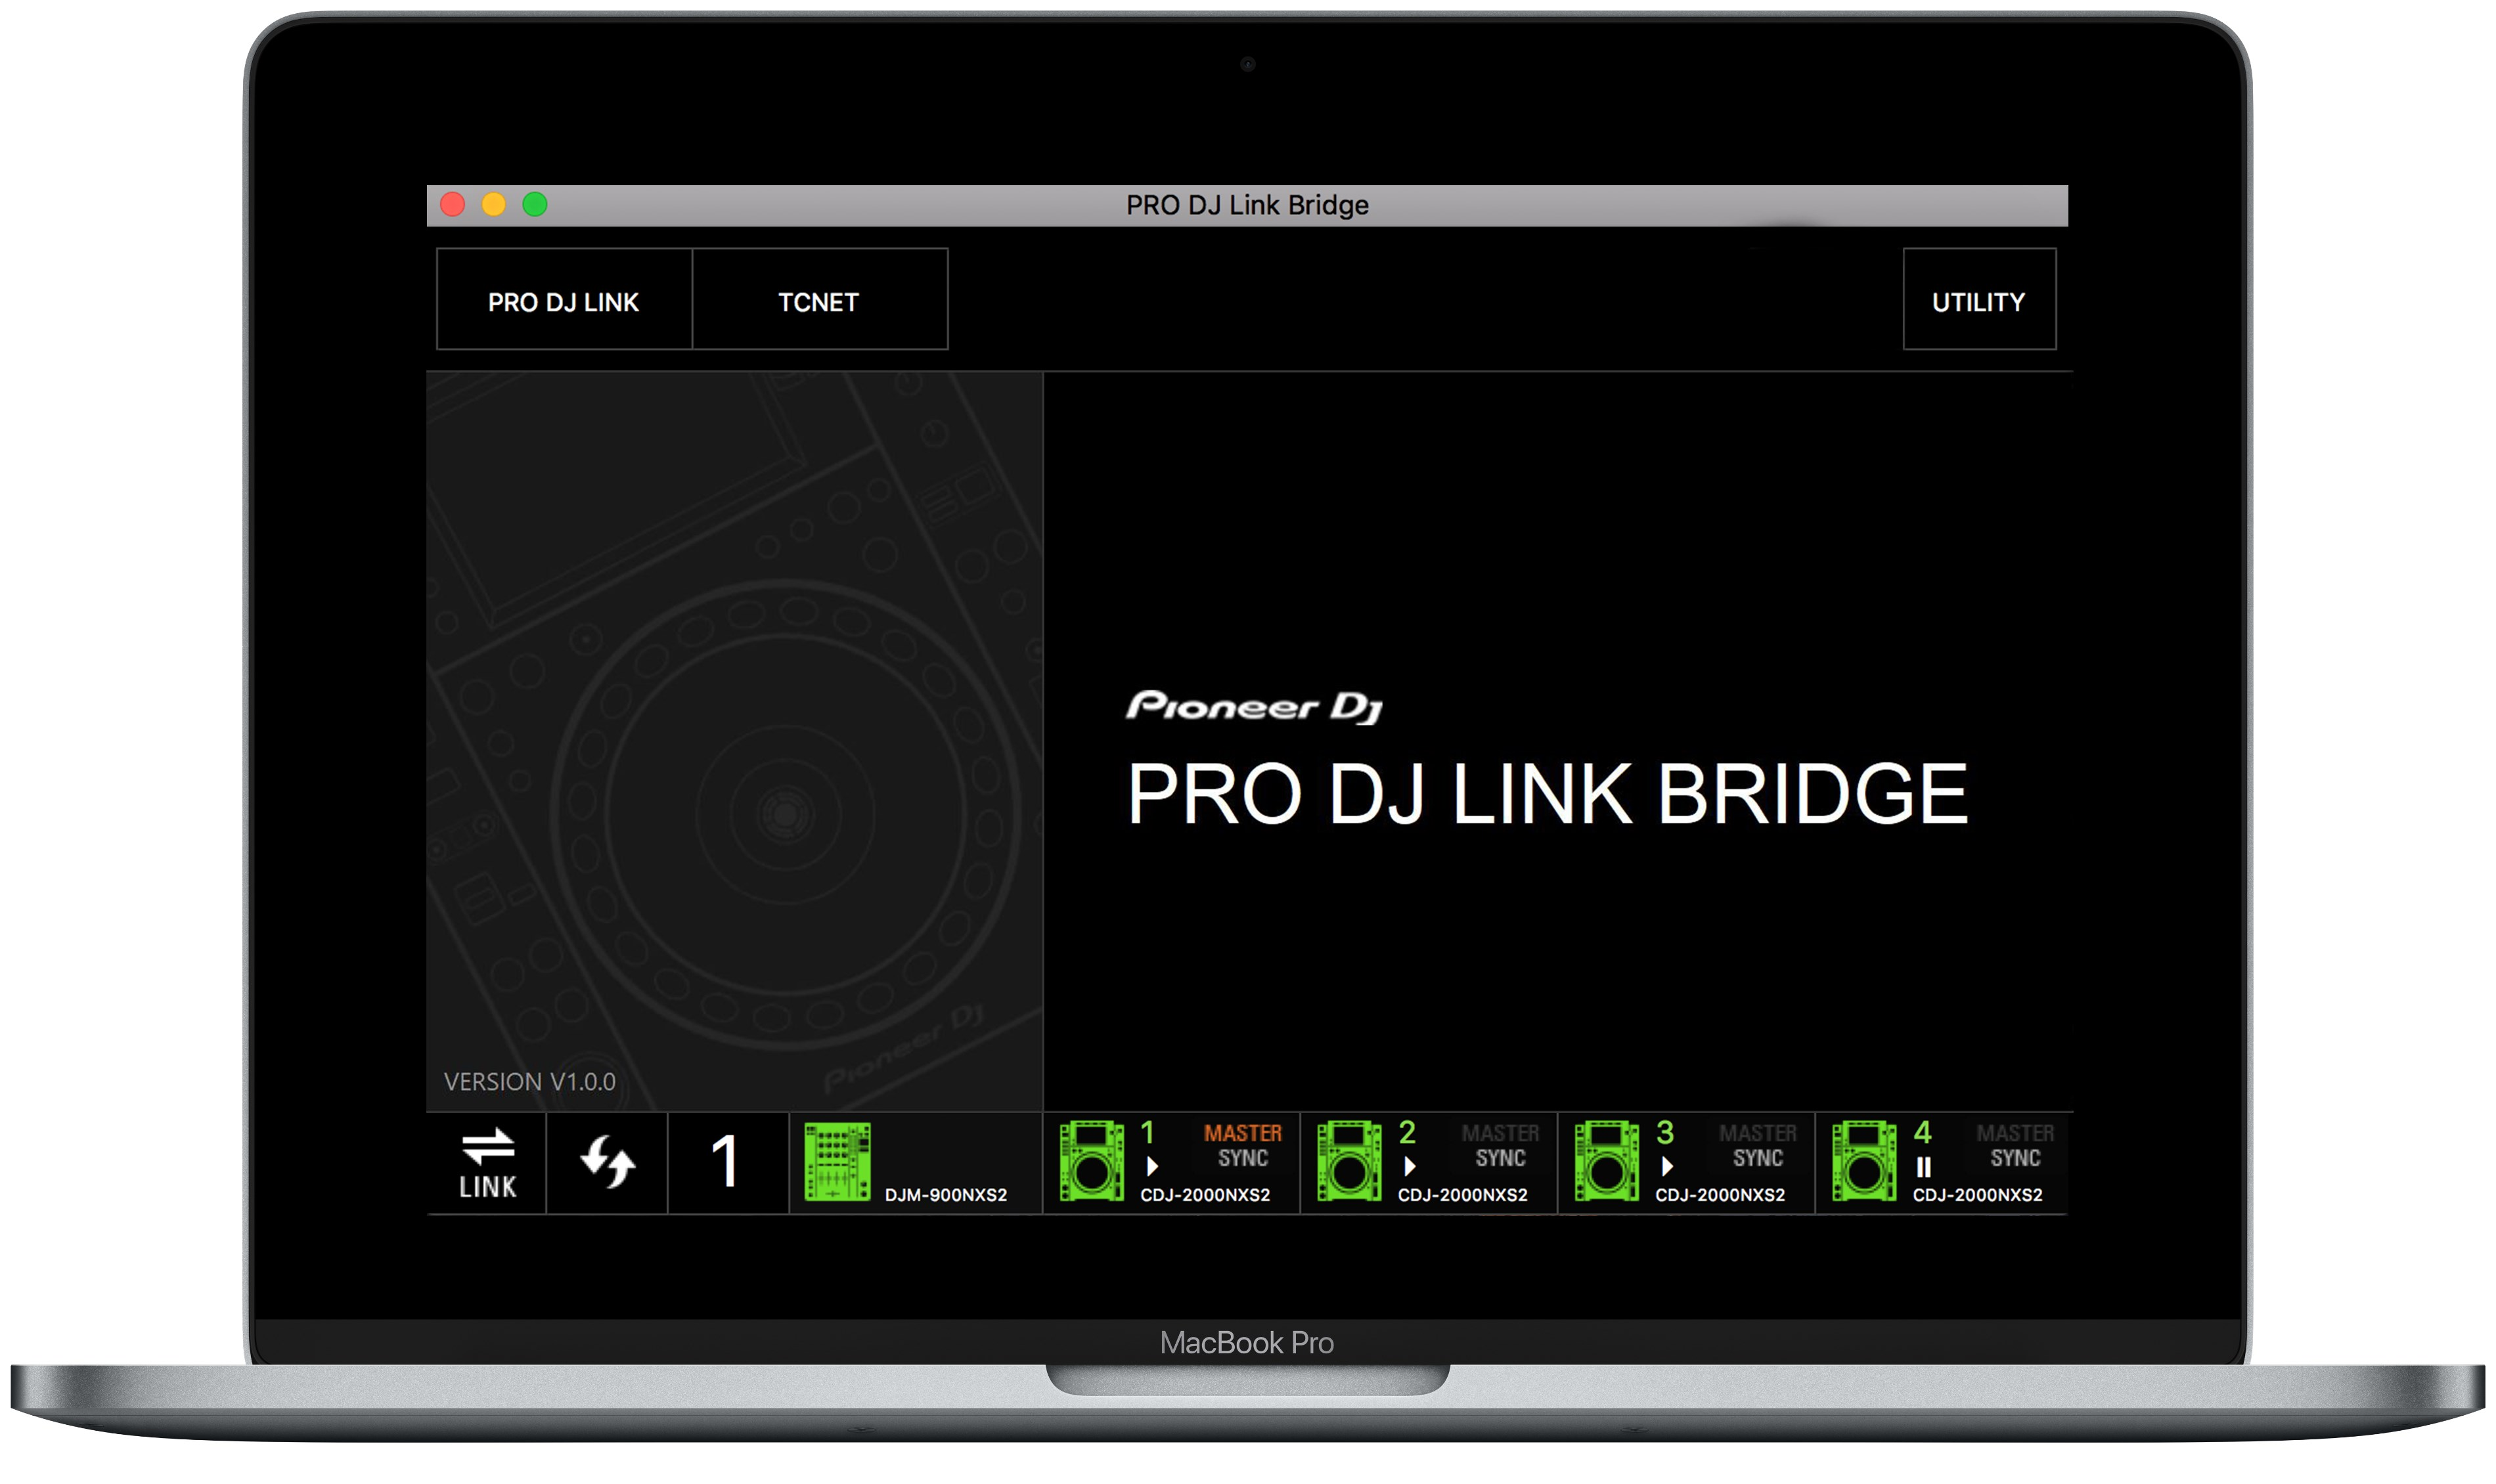 PRO DJ LINK Bridge